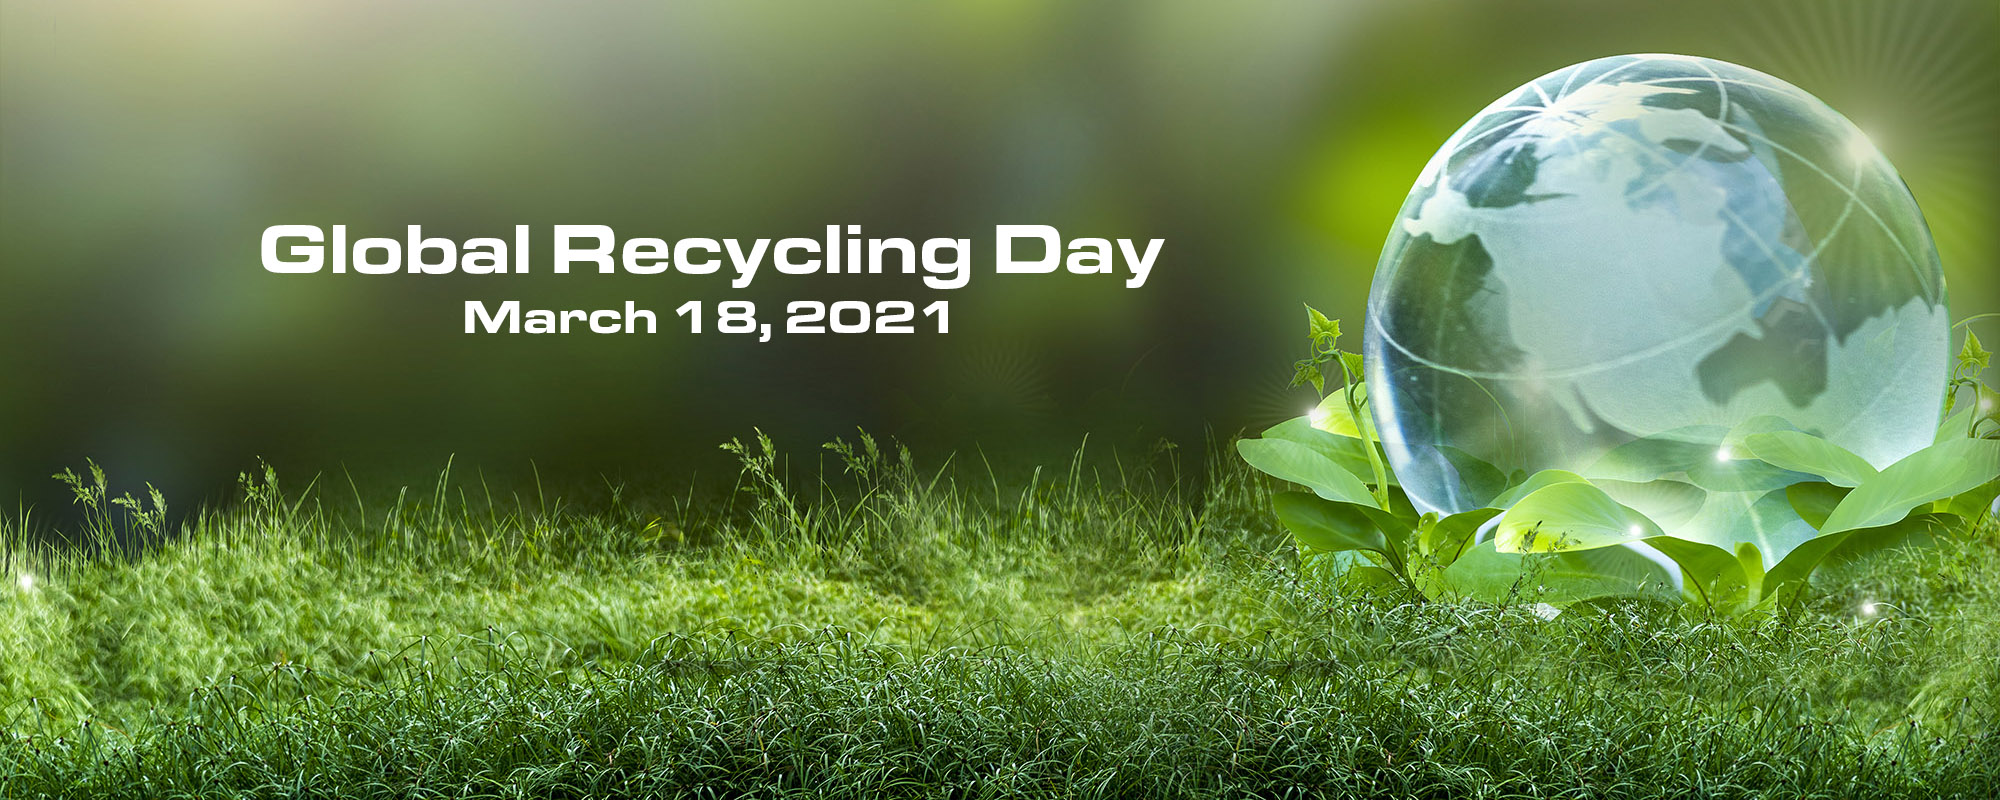 GlobalRecyclingDay 2021